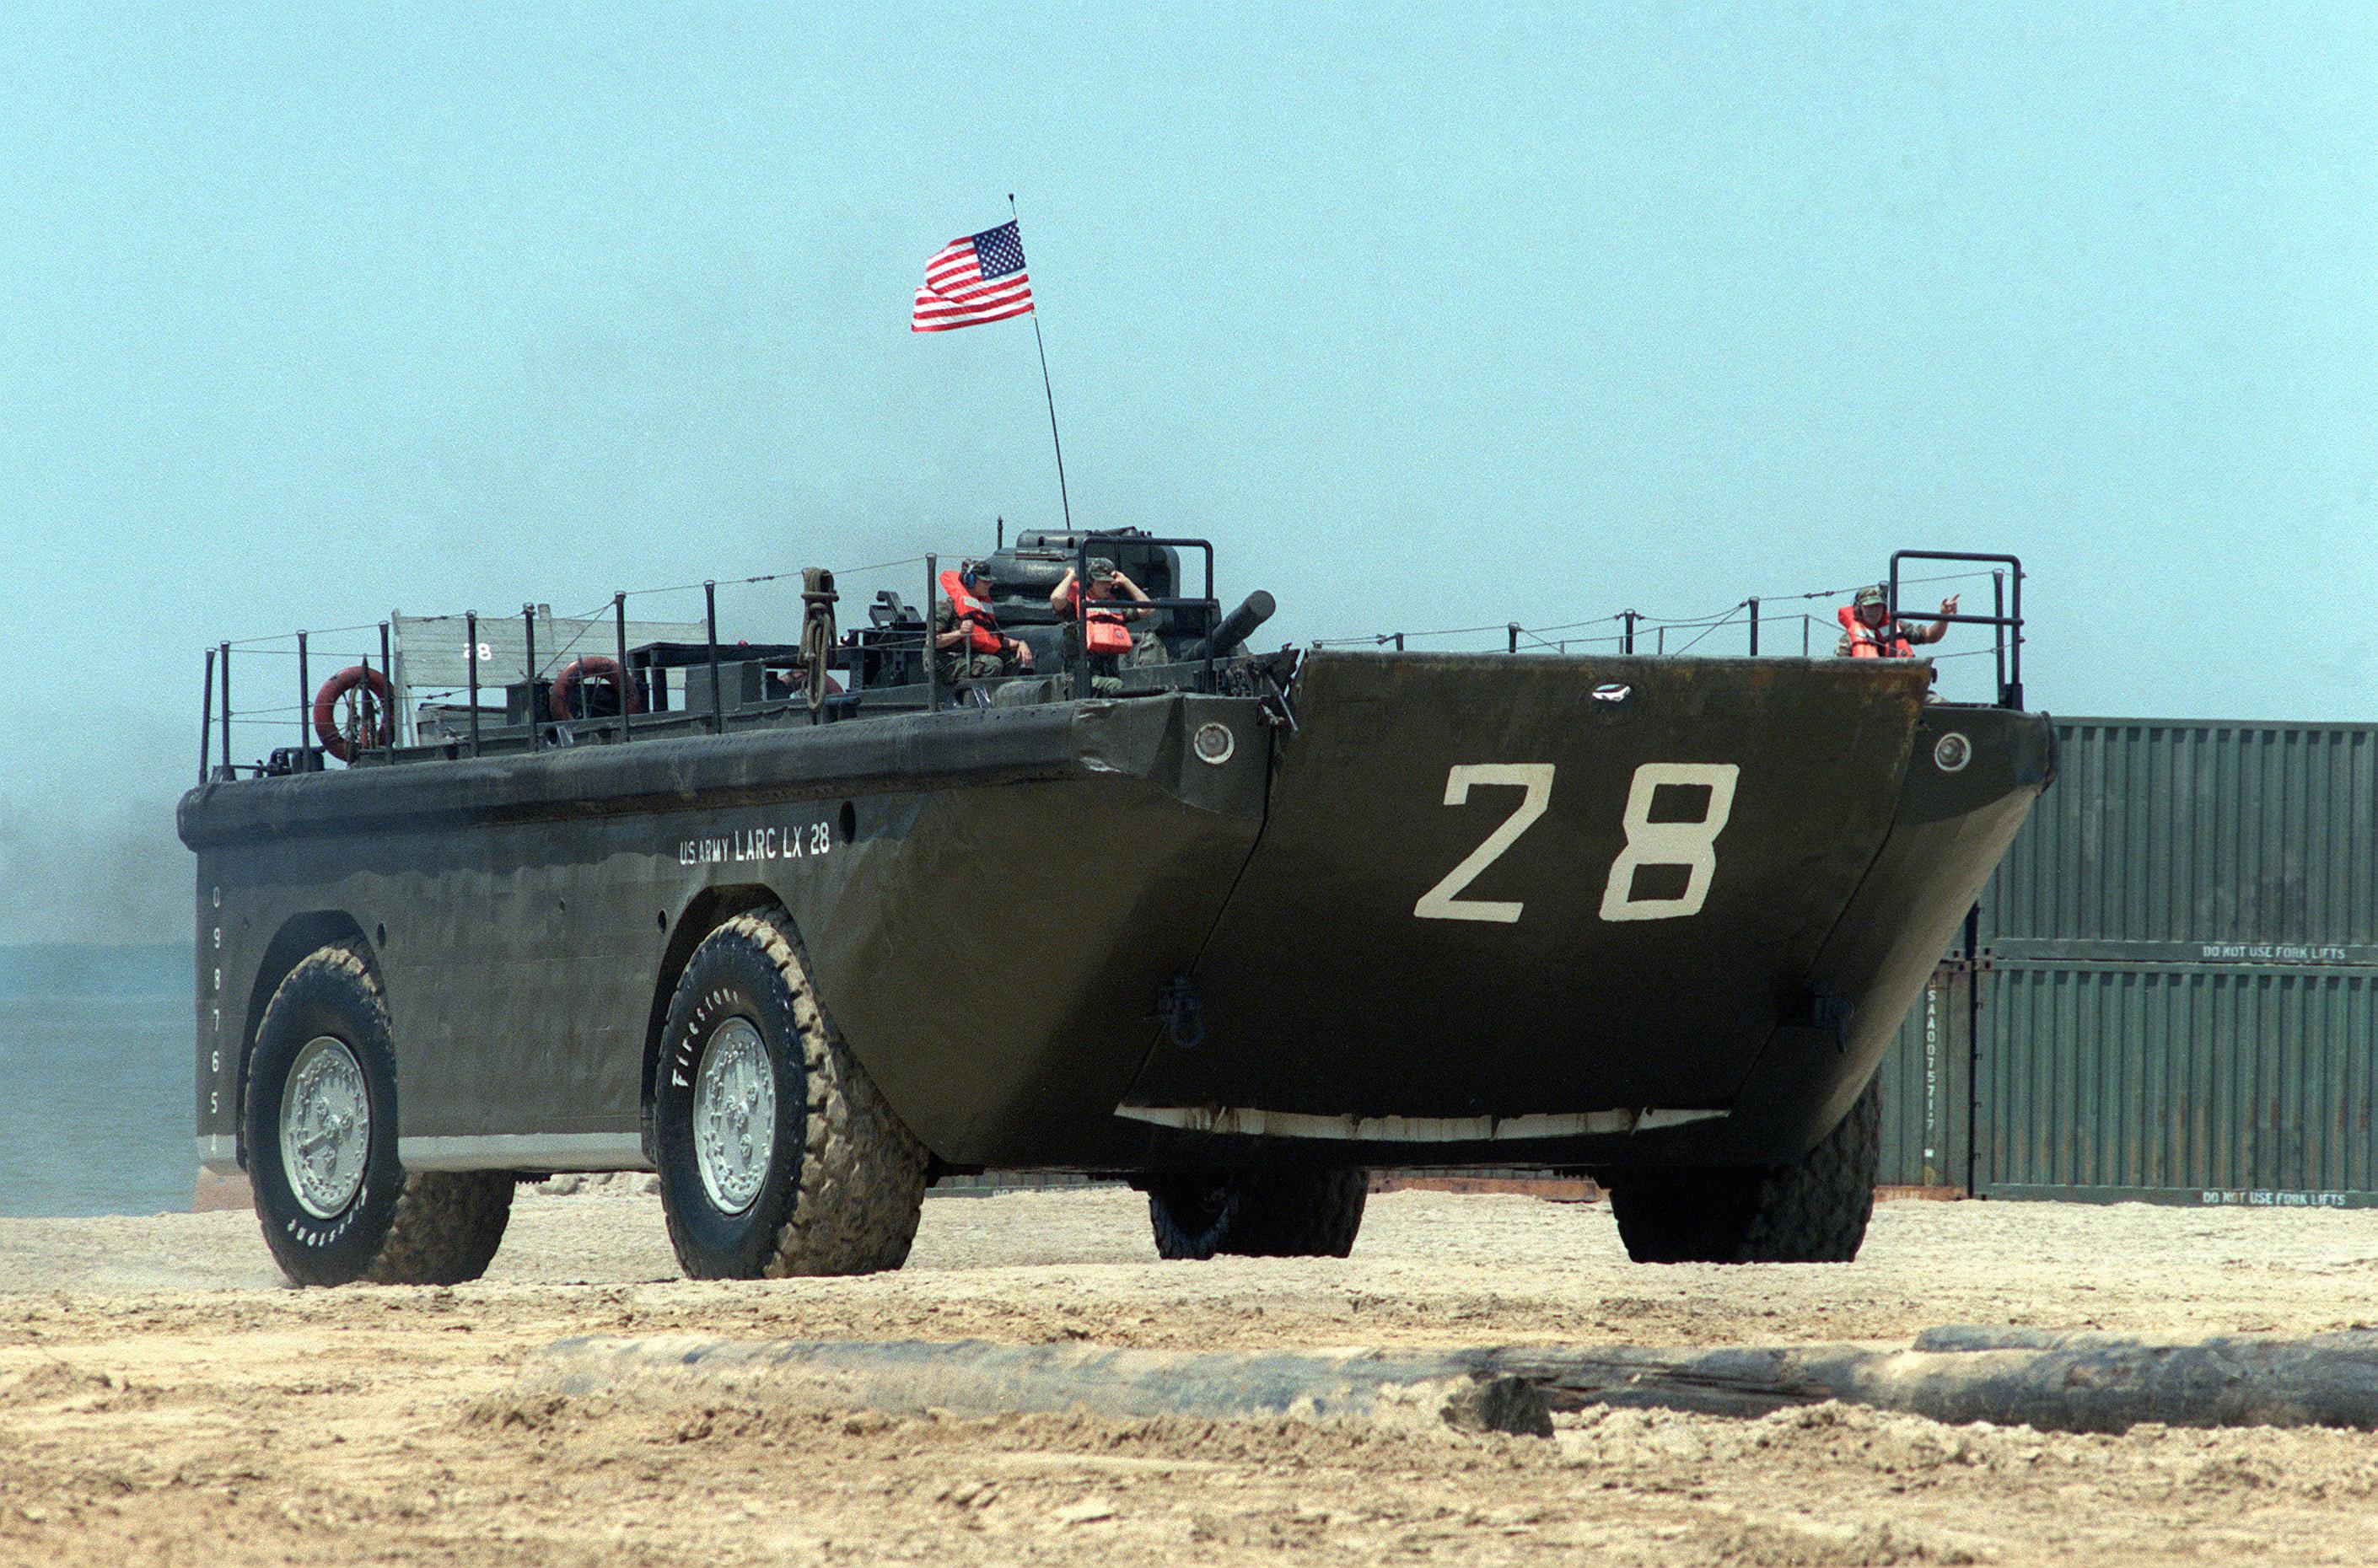 Army Surplus Landing Craft